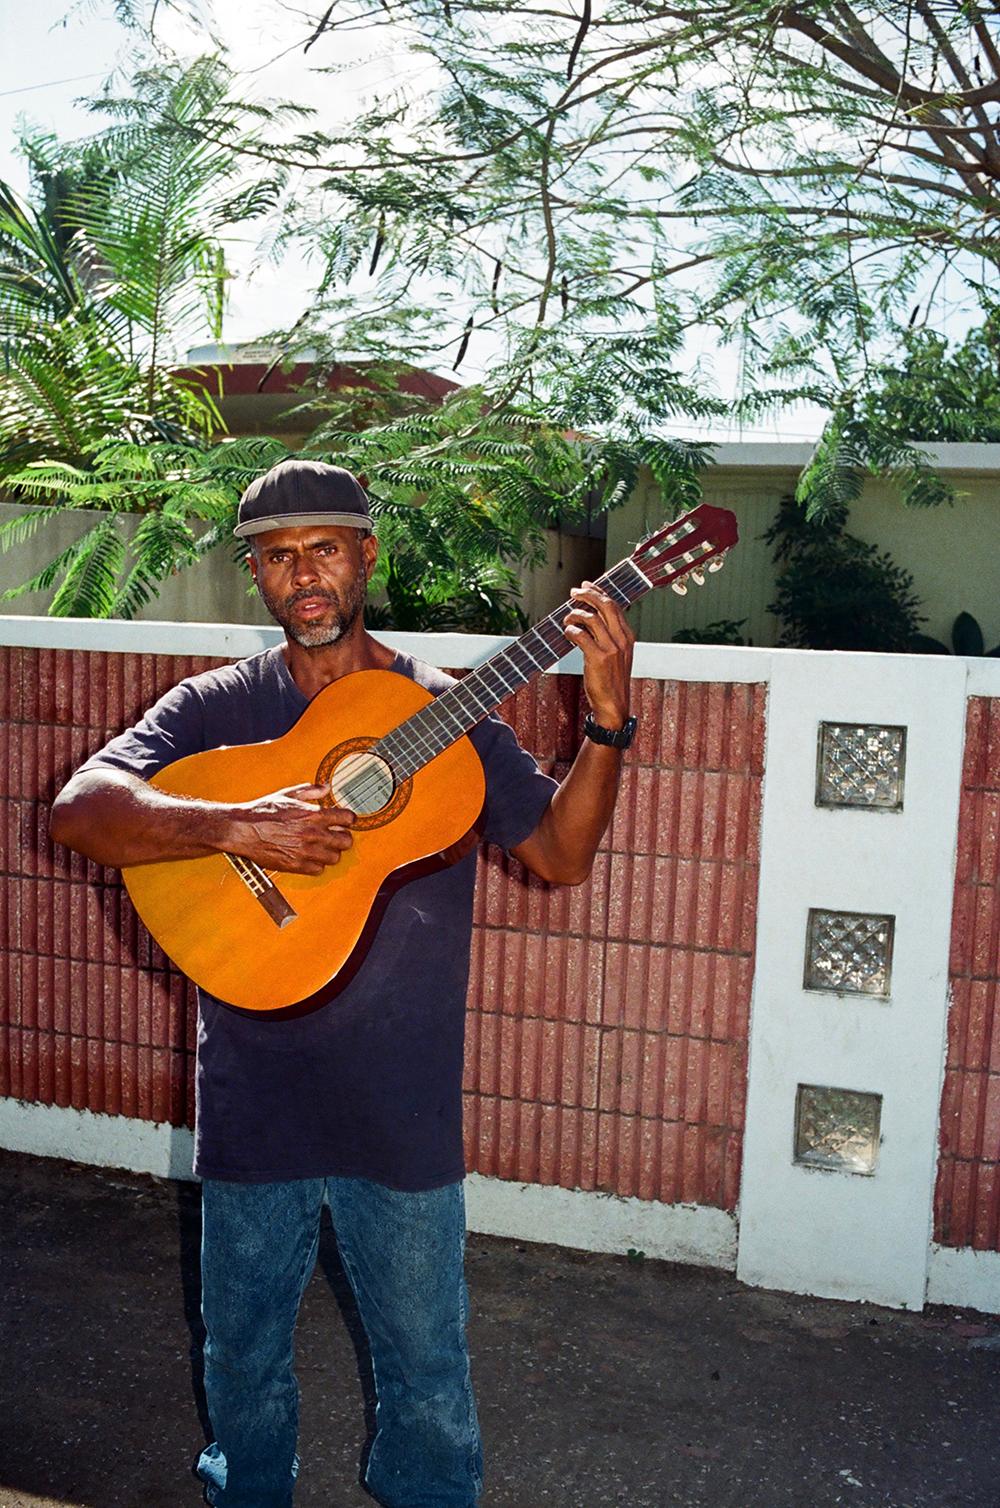 guitarguyareciboweb.jpg